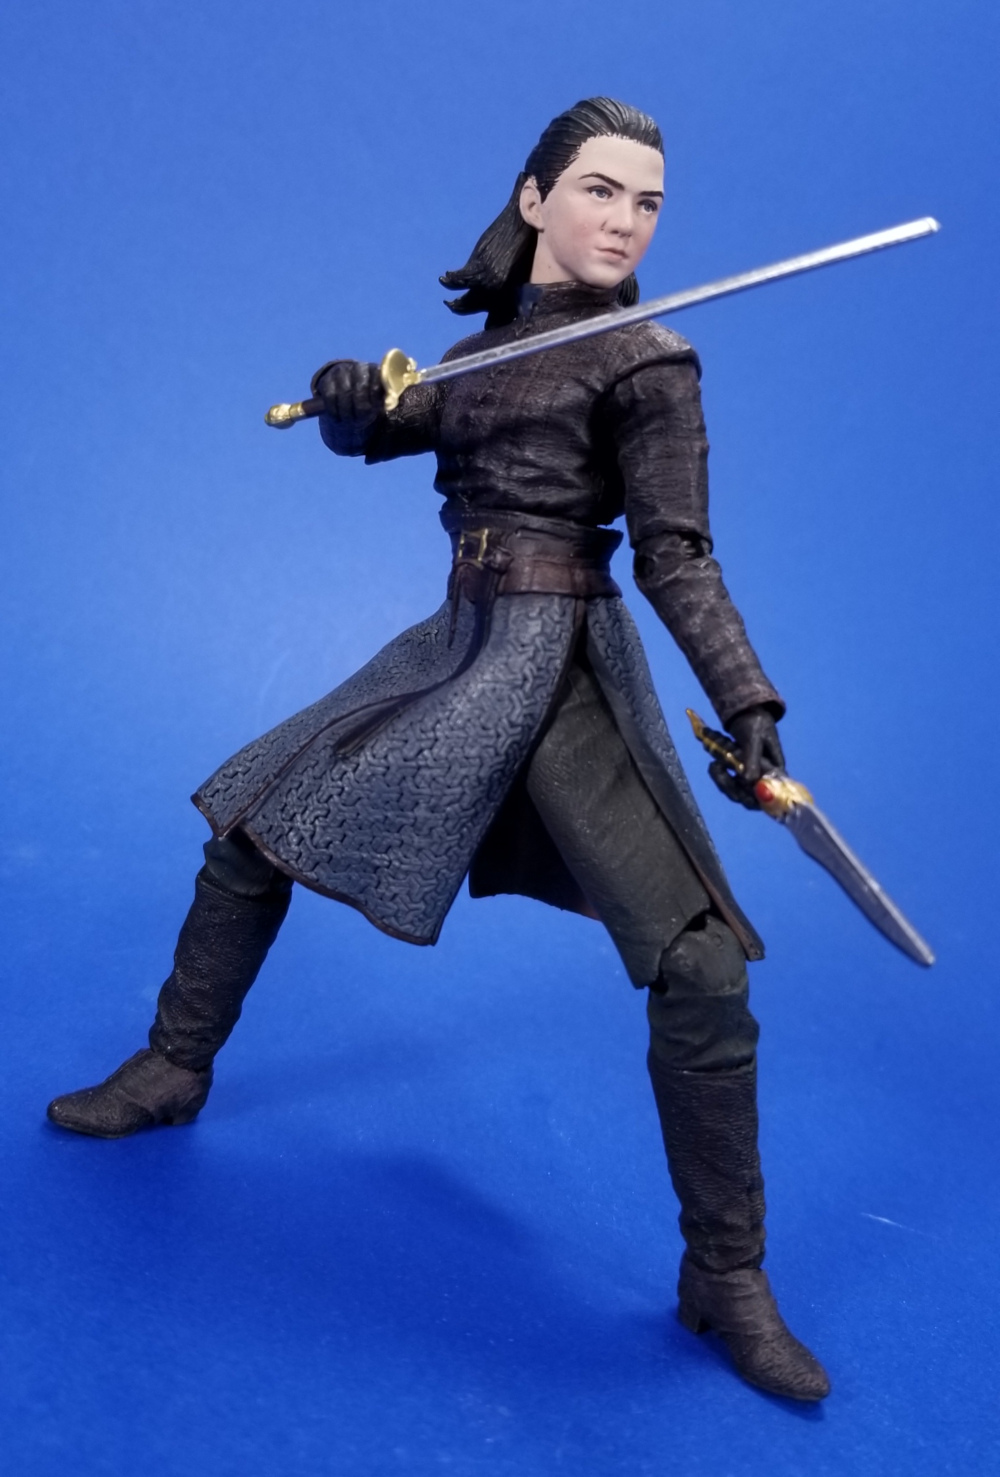 Game of Thrones Mcfarlane 6 Inch Action Figure Arya Stark